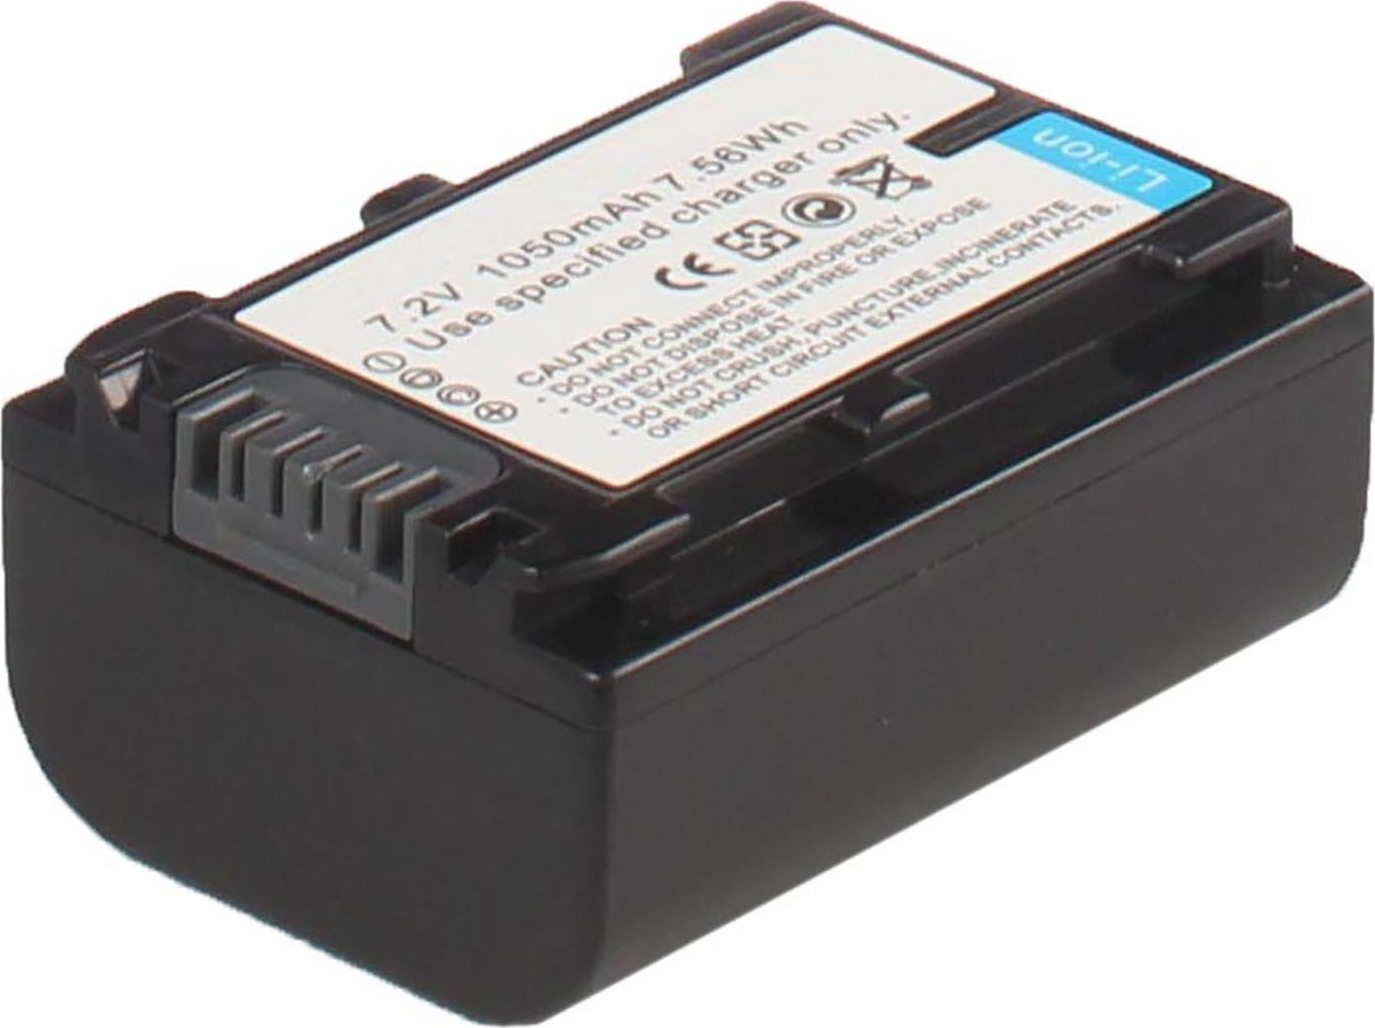 Аккумуляторная батарея iBatt iB-T4-F298 600mAh для камер Sony HDR-XR260VE, DCR-SX83E, HDR-CX550, HDR-CX740E, HDR-XR160E, HDR-CX150E, HDR-TD10E, HDR-XR260E, DCR-SX83, HDR-CX260E, HDR-PJ420E, HDR-XR350, HDR-CX160E, HDR-CX260VE, HDR-CX350, HDR-XR100,